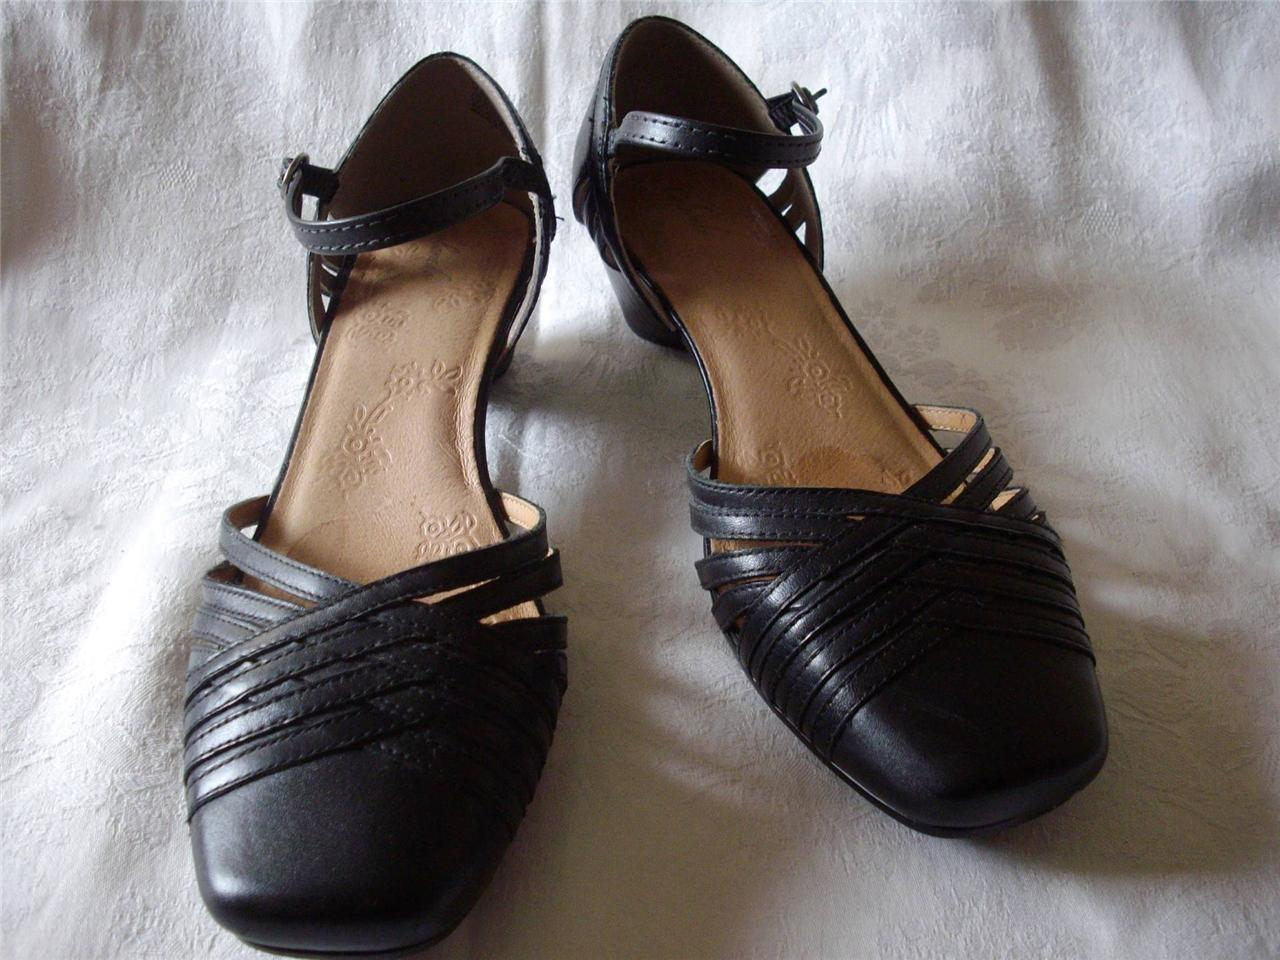 Designer-Ladies-Leather-Shoes-Black-Mary-Jane-style-Flat-Size-7-5-Very-Good